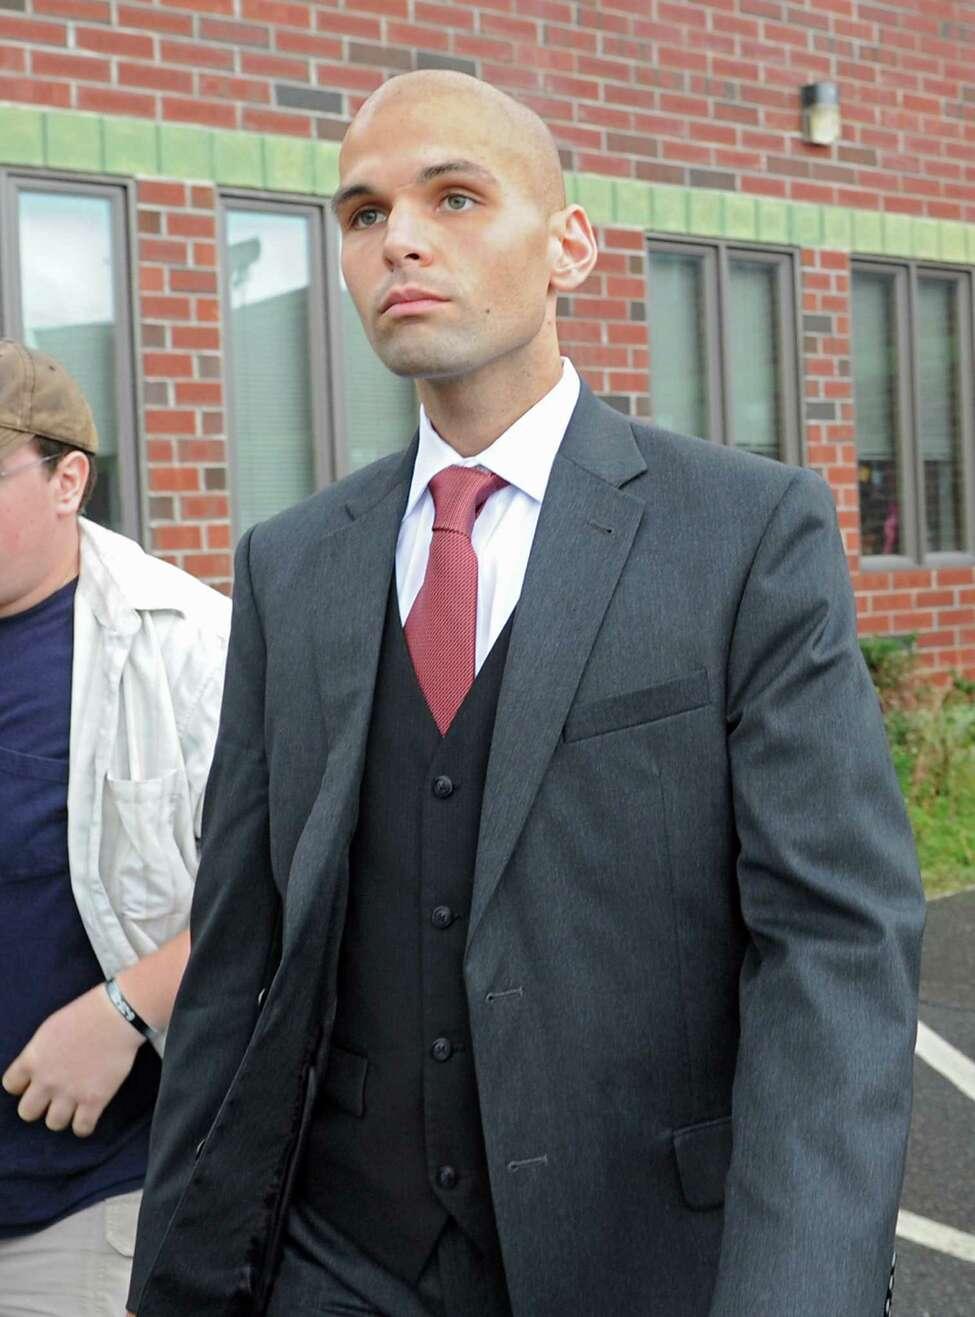 Rev. James Michael Taylor leaves Clifton Park Town Court on Wednesday, Aug. 13, 2014 in Clifton Park, N.Y. (Lori Van Buren / Times Union)